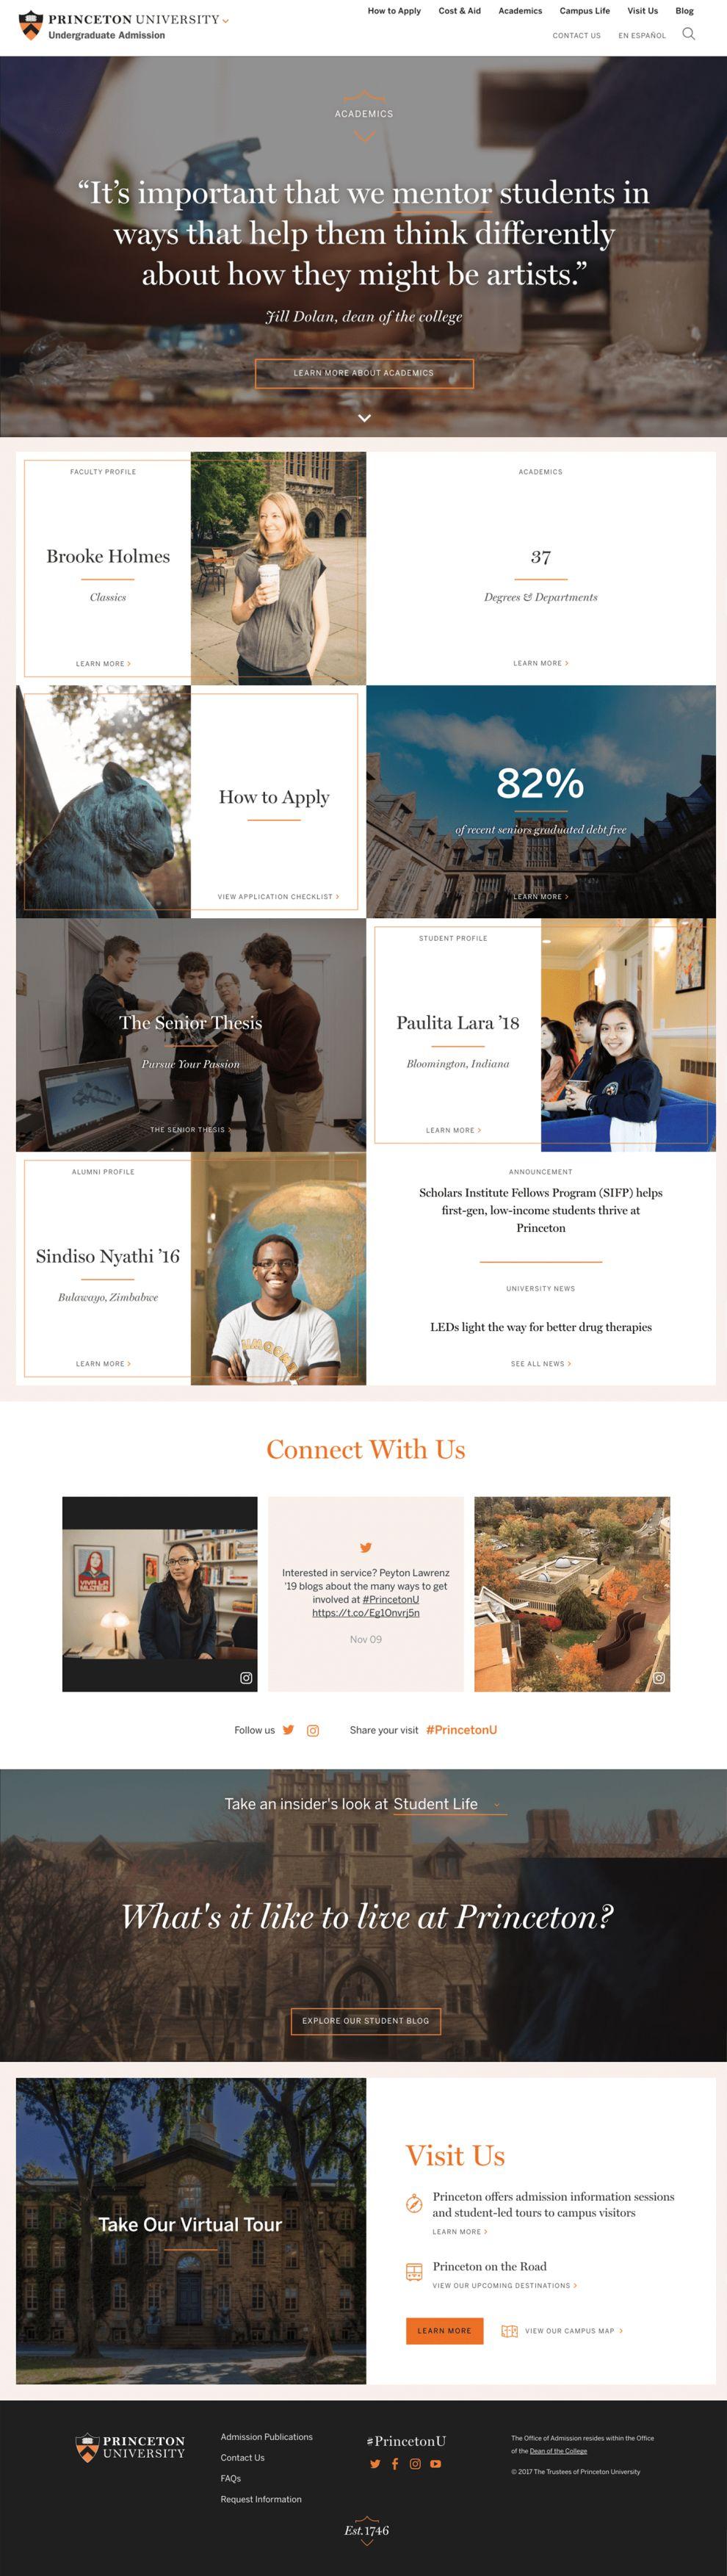 Princeton University Professional Homepage